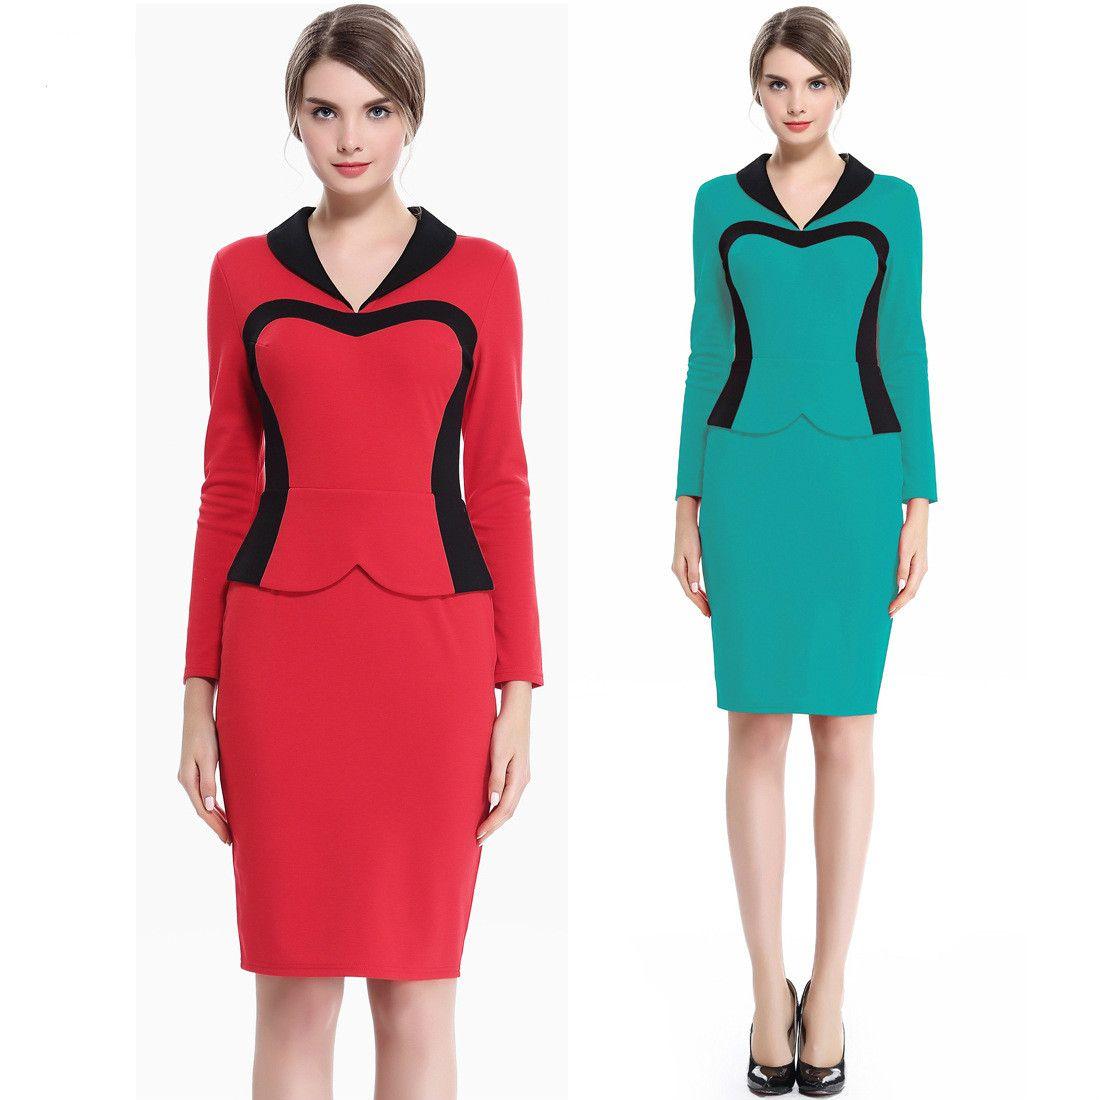 2019 Work Clothing Lady Elegant Long Sleeve Career Dresses Slim High ...